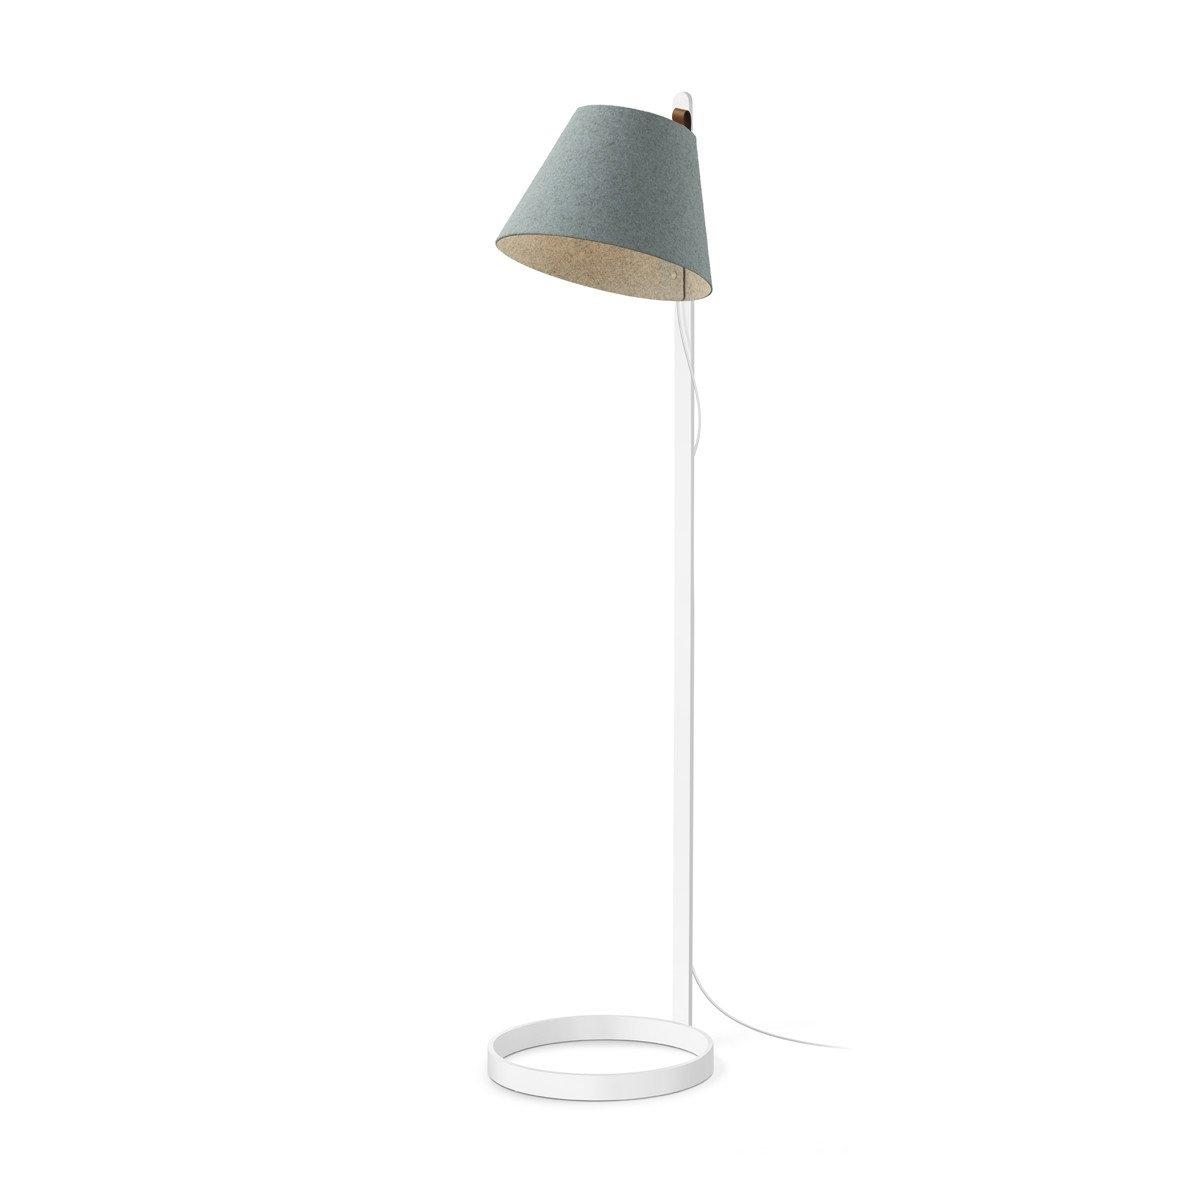 PABLO LIGHTING LANA FLOOR LAMP - SHOP